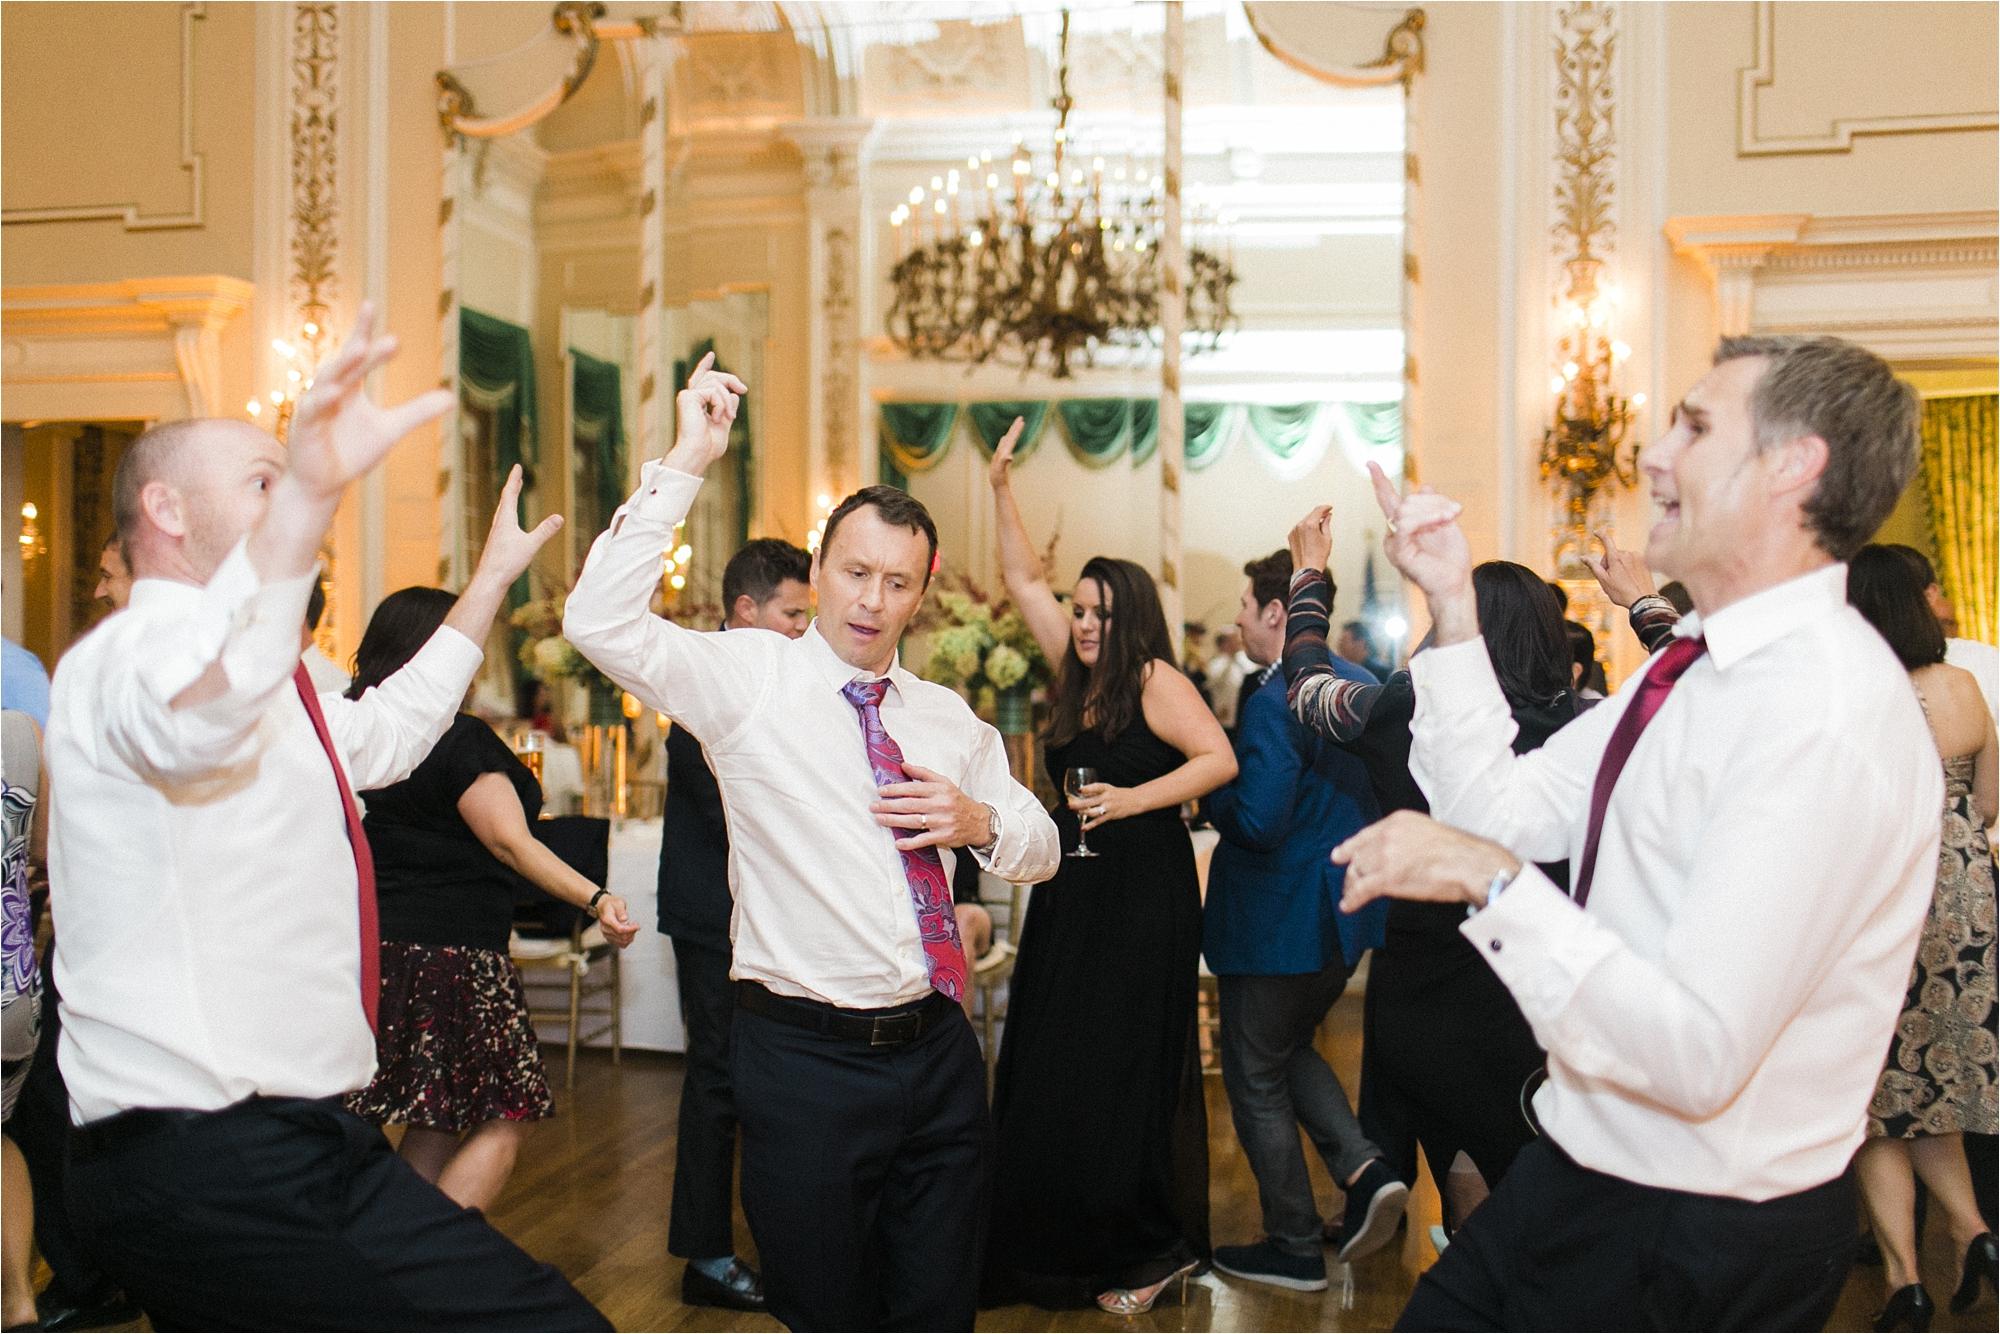 stephanie-yonce-photography-elegant-private-club-washington-dc-wedding-photos_0060.jpg